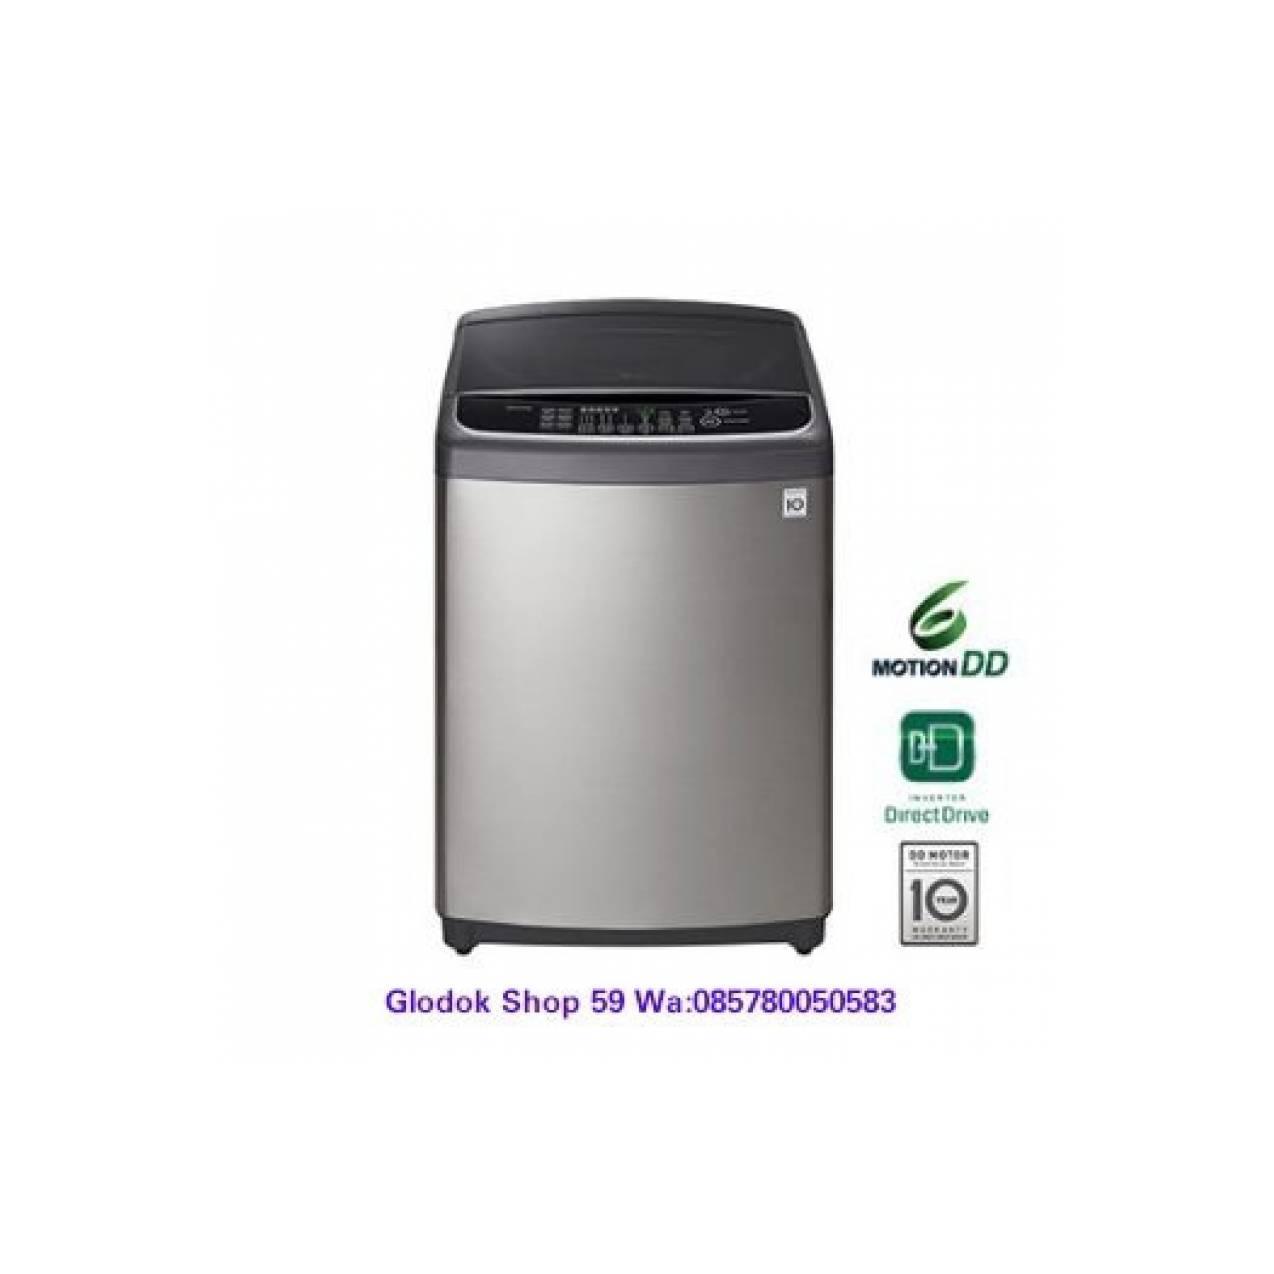 Harga Mesin Cuci Lg 6 Kg Terbaru Paling Laris F1007nppw 12 T2112vssa Motion Dd Inverter Top Loading New